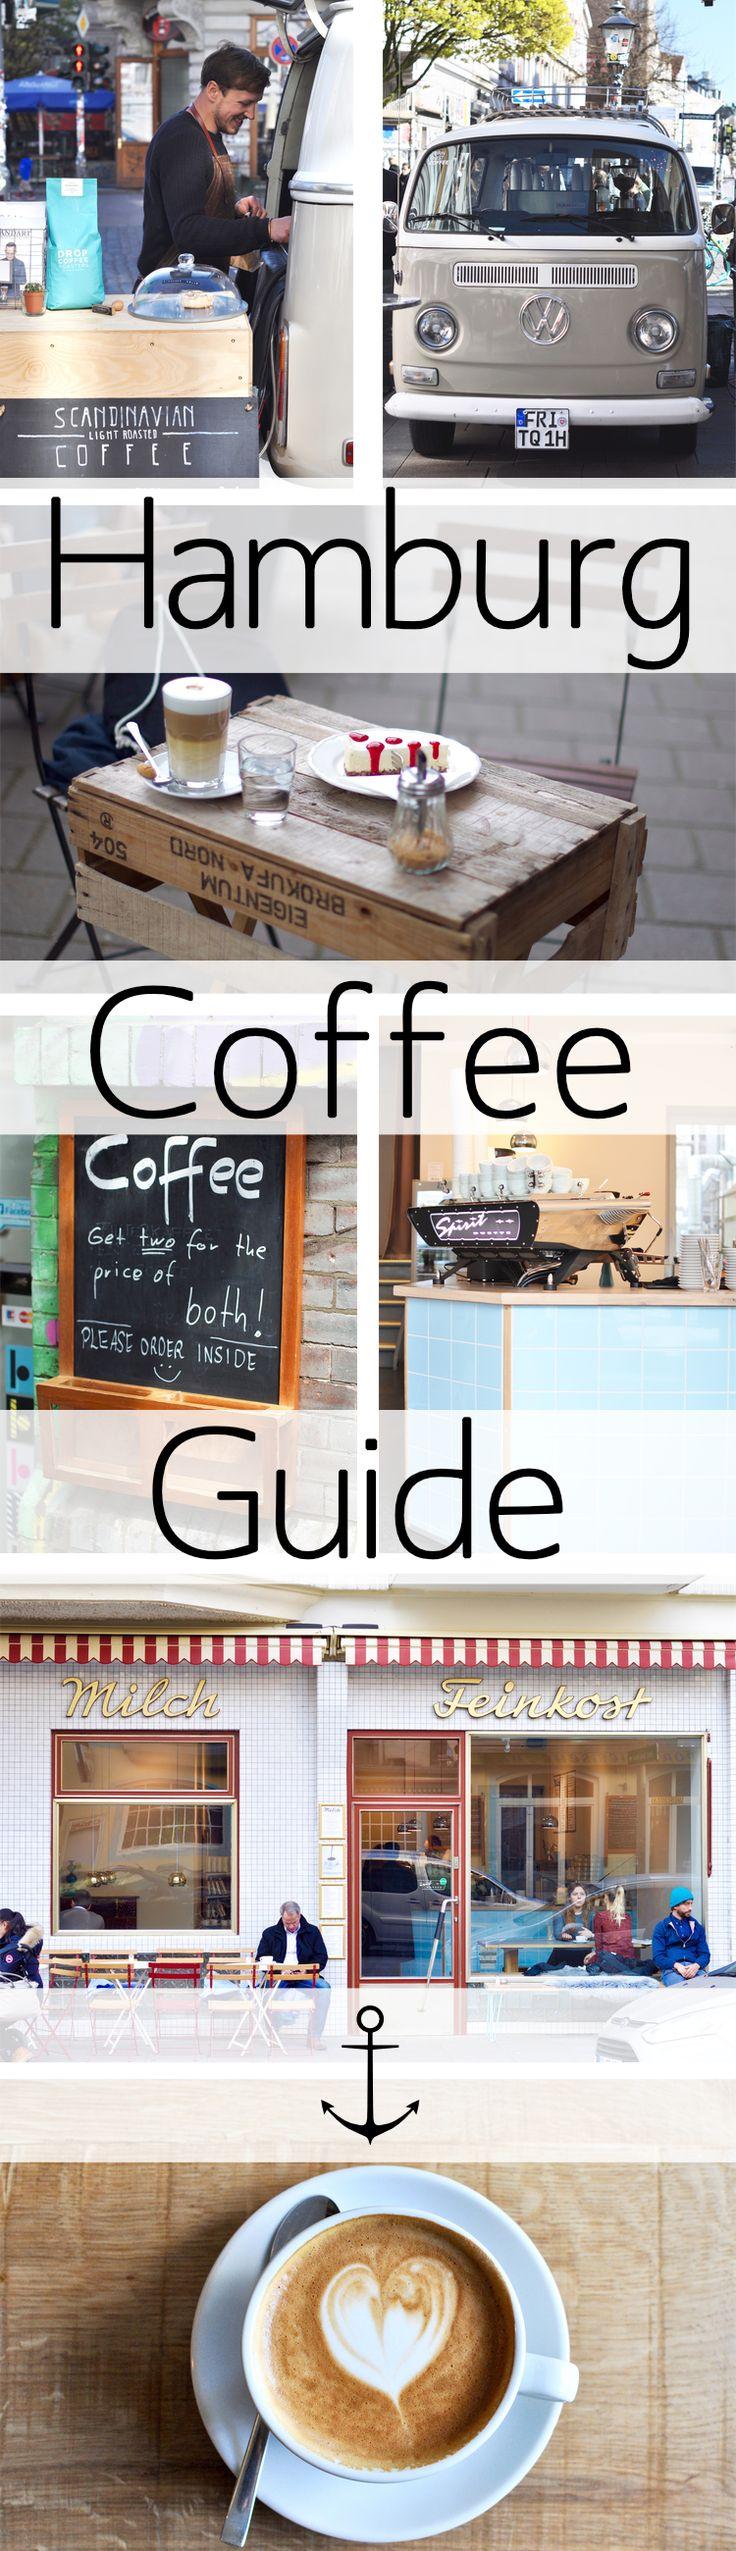 Hamburg ultimate Coffee Guide